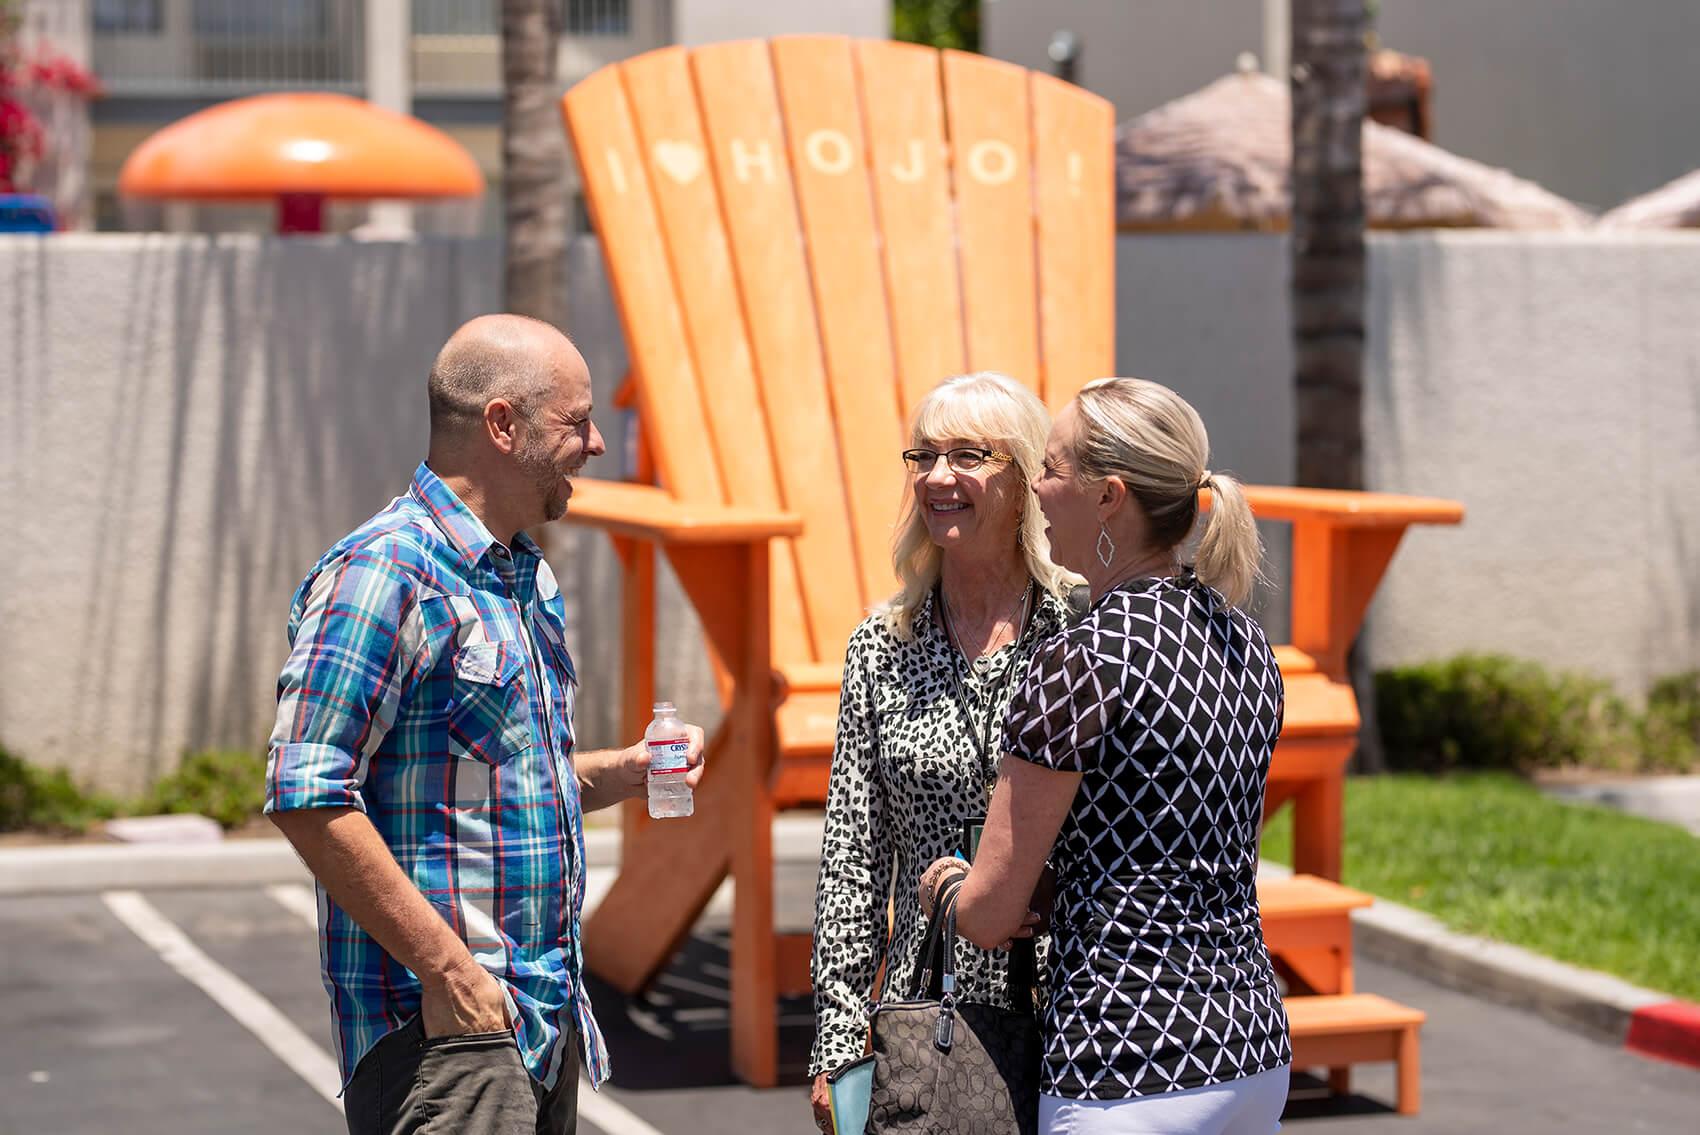 three adults talk at the Howard Johnson Anaheim retro re-do near the large orange Adirondack chair